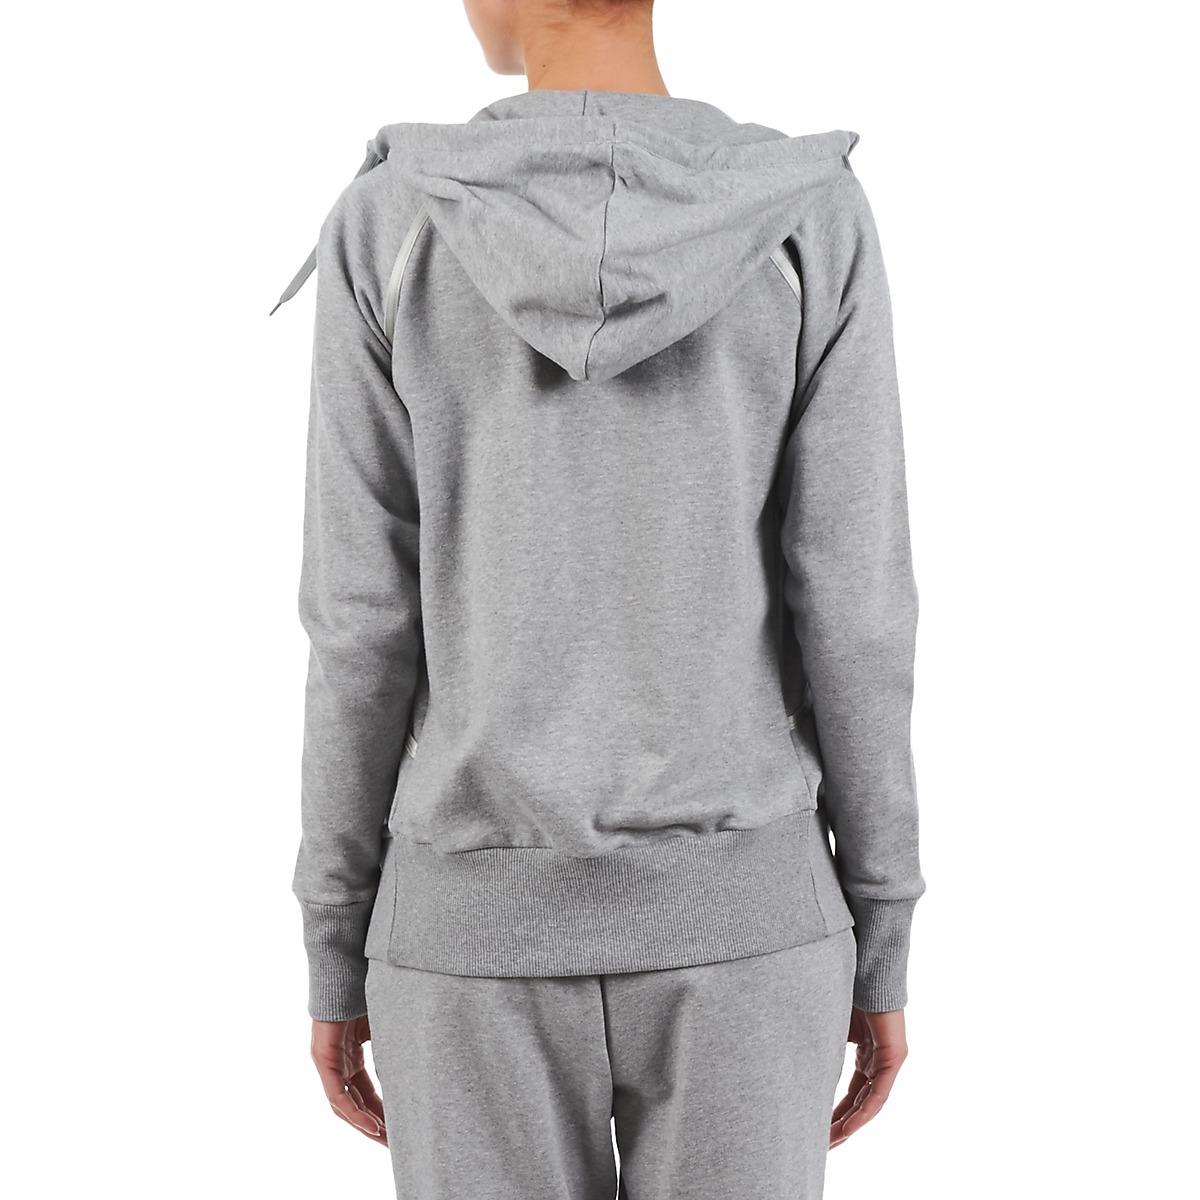 Женская толстовка Asics Knit Full Zip Hoodie Grey (109872 0714) фото